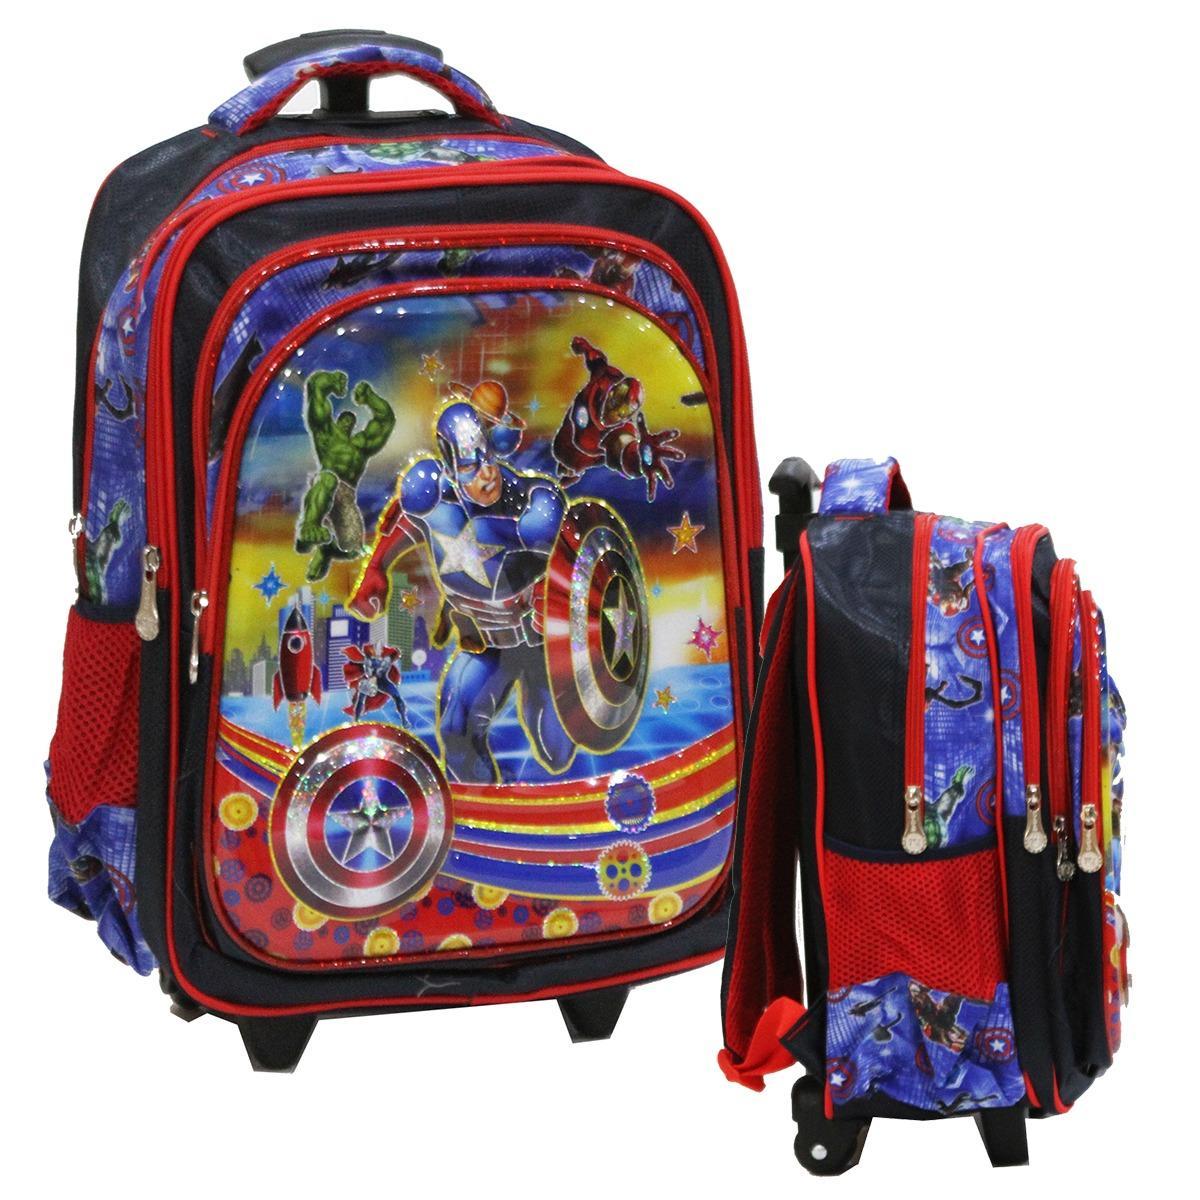 Diskon Onlan Marvel Avengers Captain America 6D Timbul Anti Gores Tas Trolley Anak Sekolah Ukuran Sd Import Branded